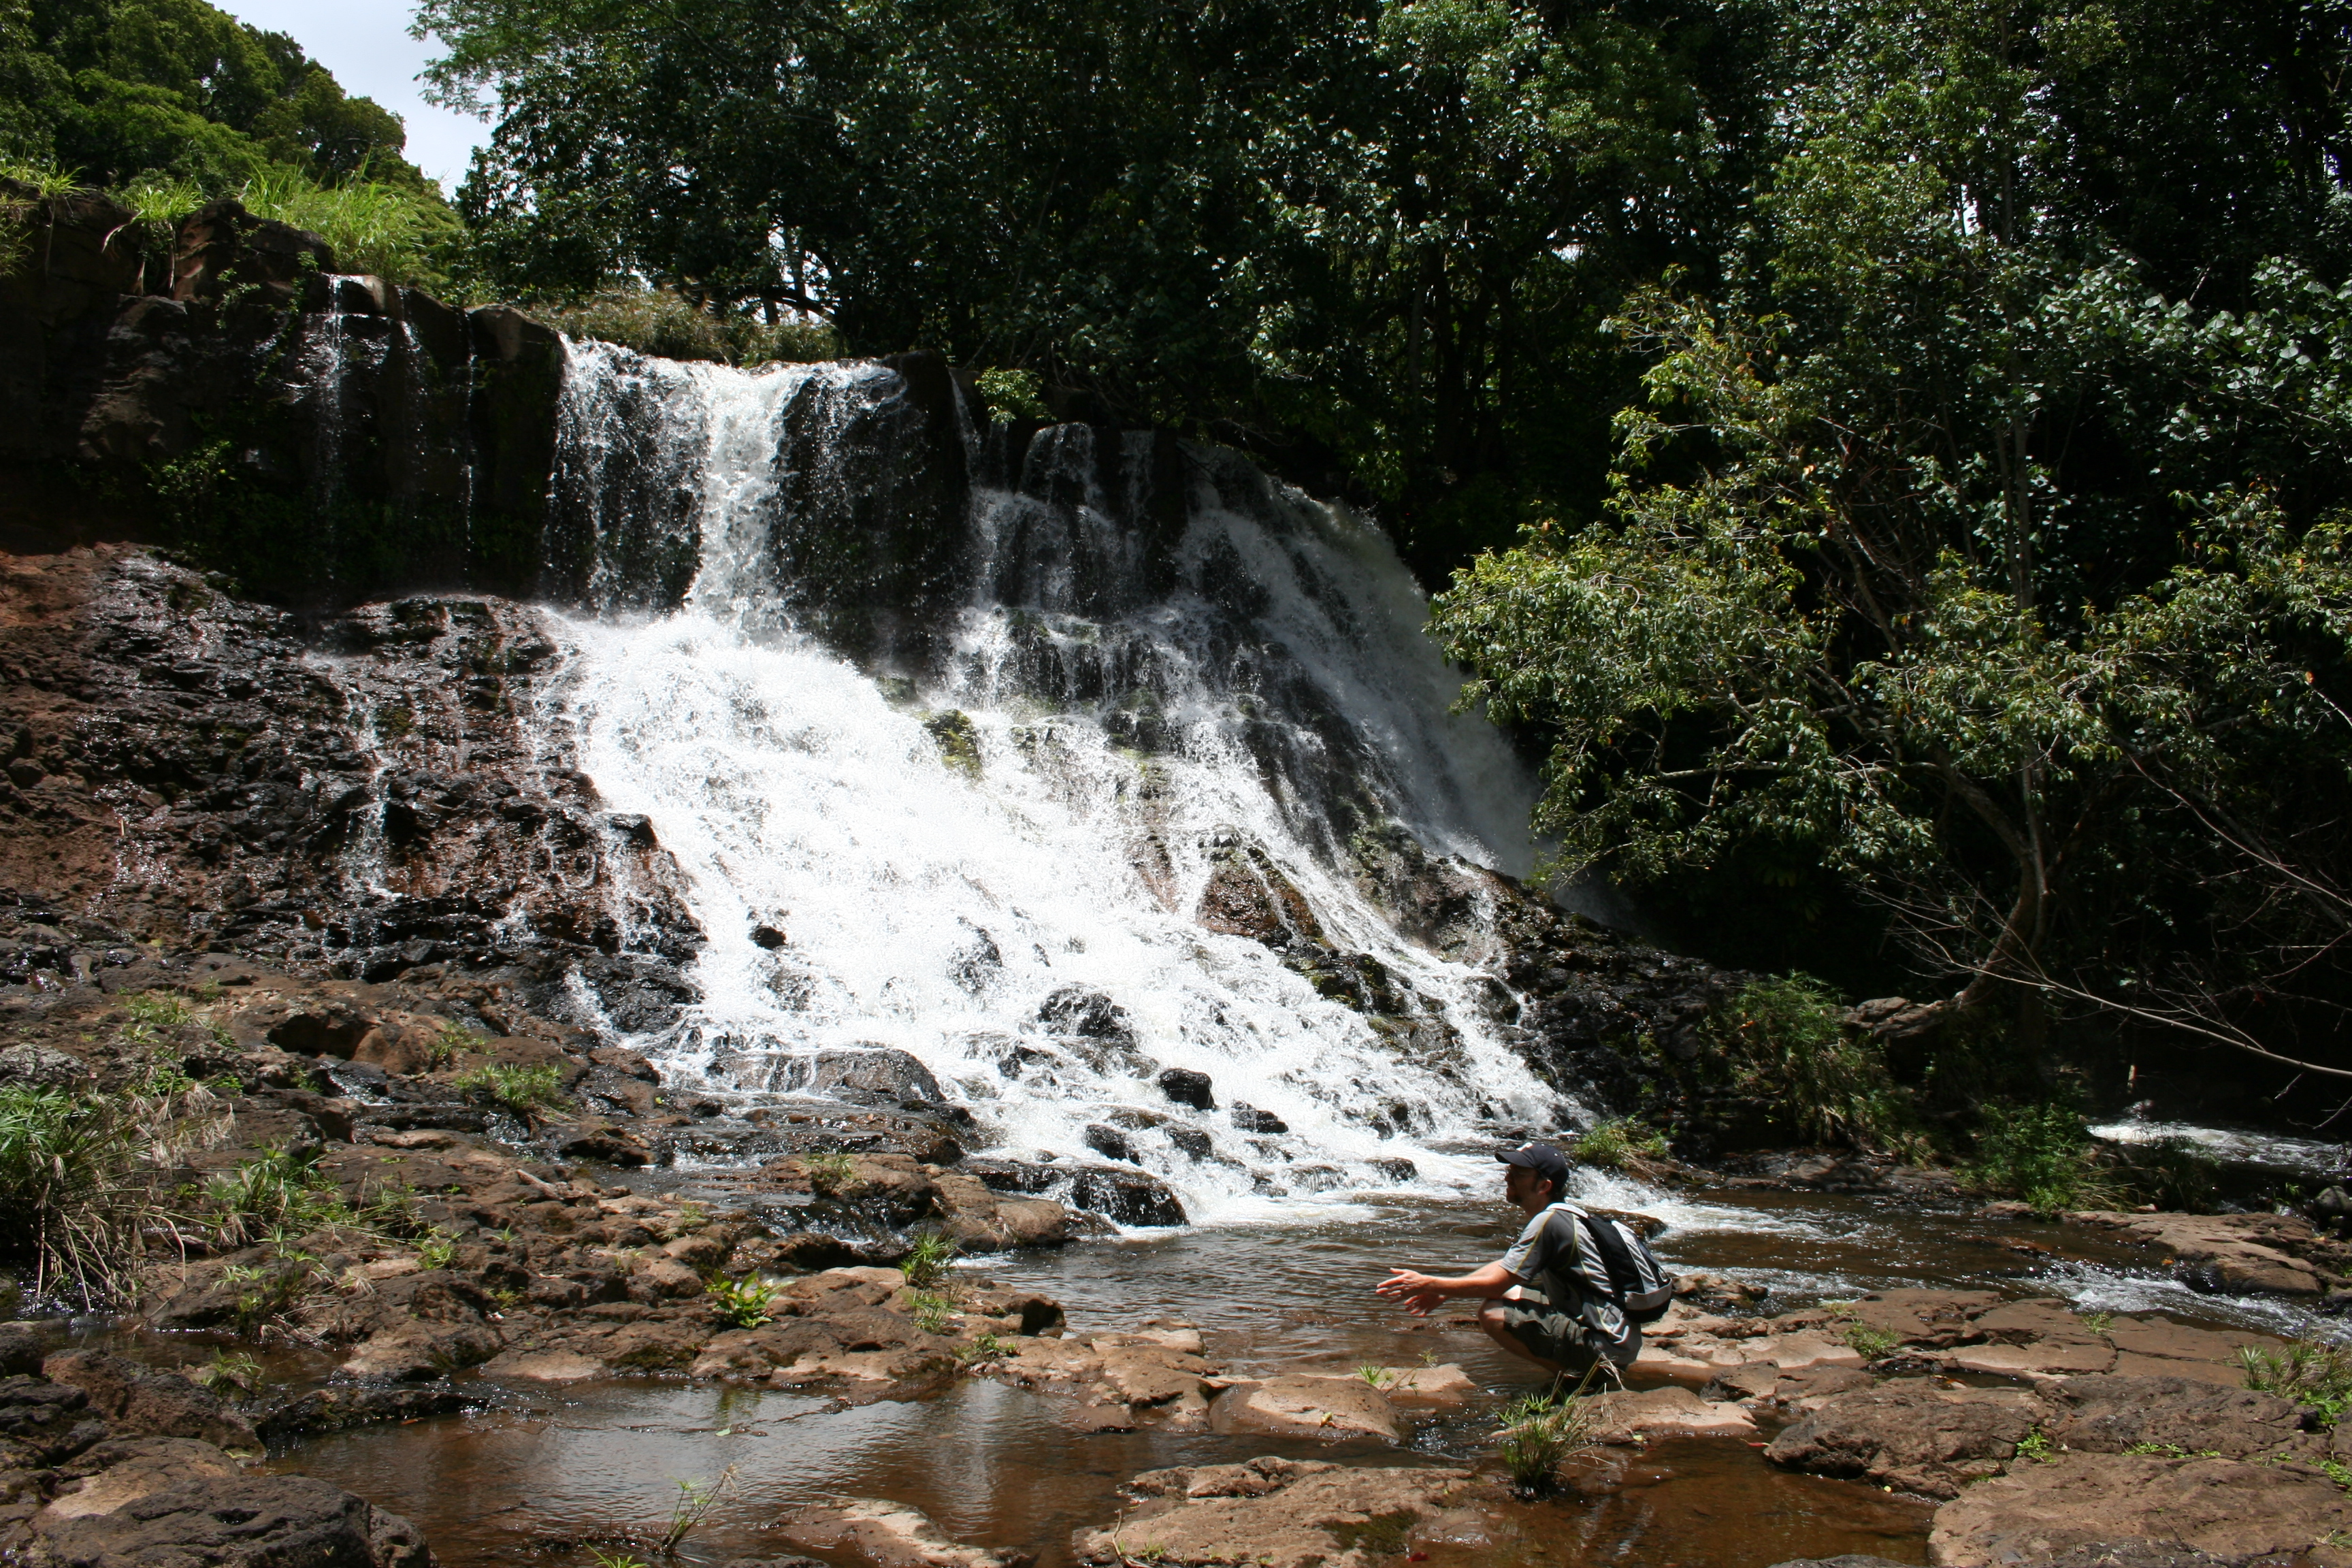 Hikerly Ho Opi I Falls Hike 2 2 Miles 563 Feet